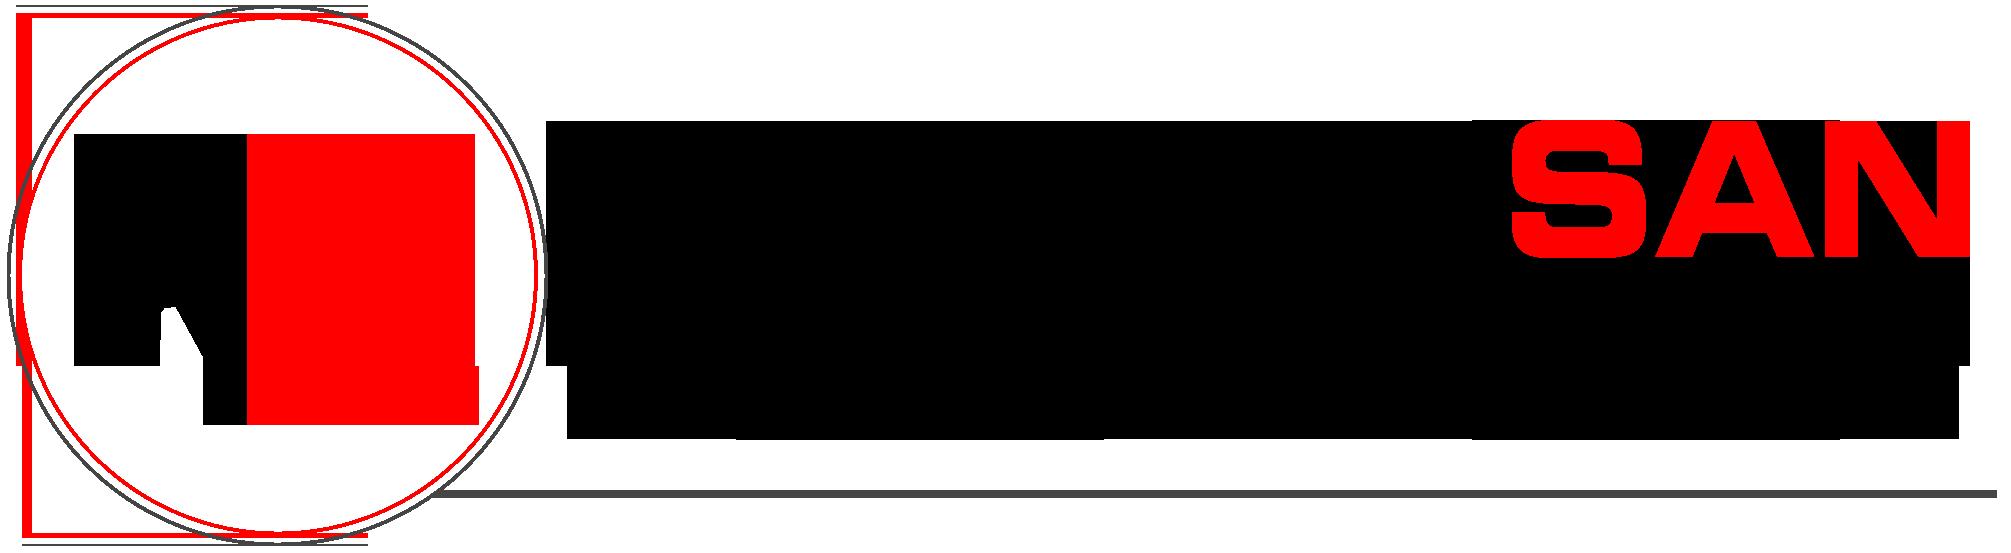 Yildirimsan Kompresör Logo